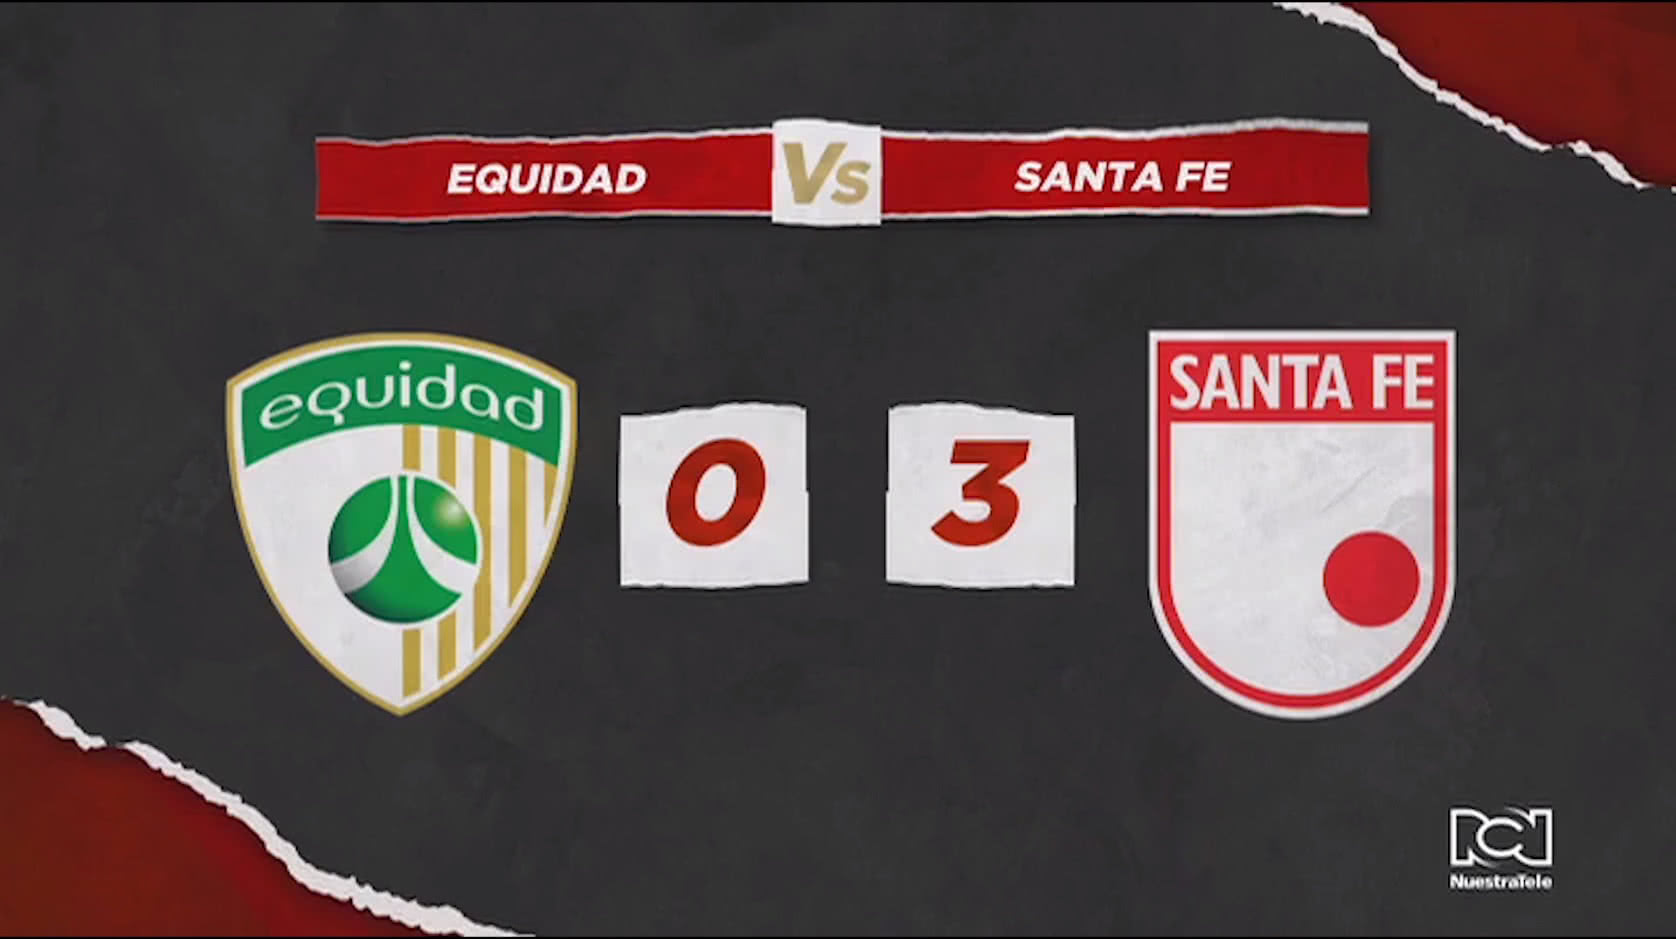 La Equidad Vs Santa Fe